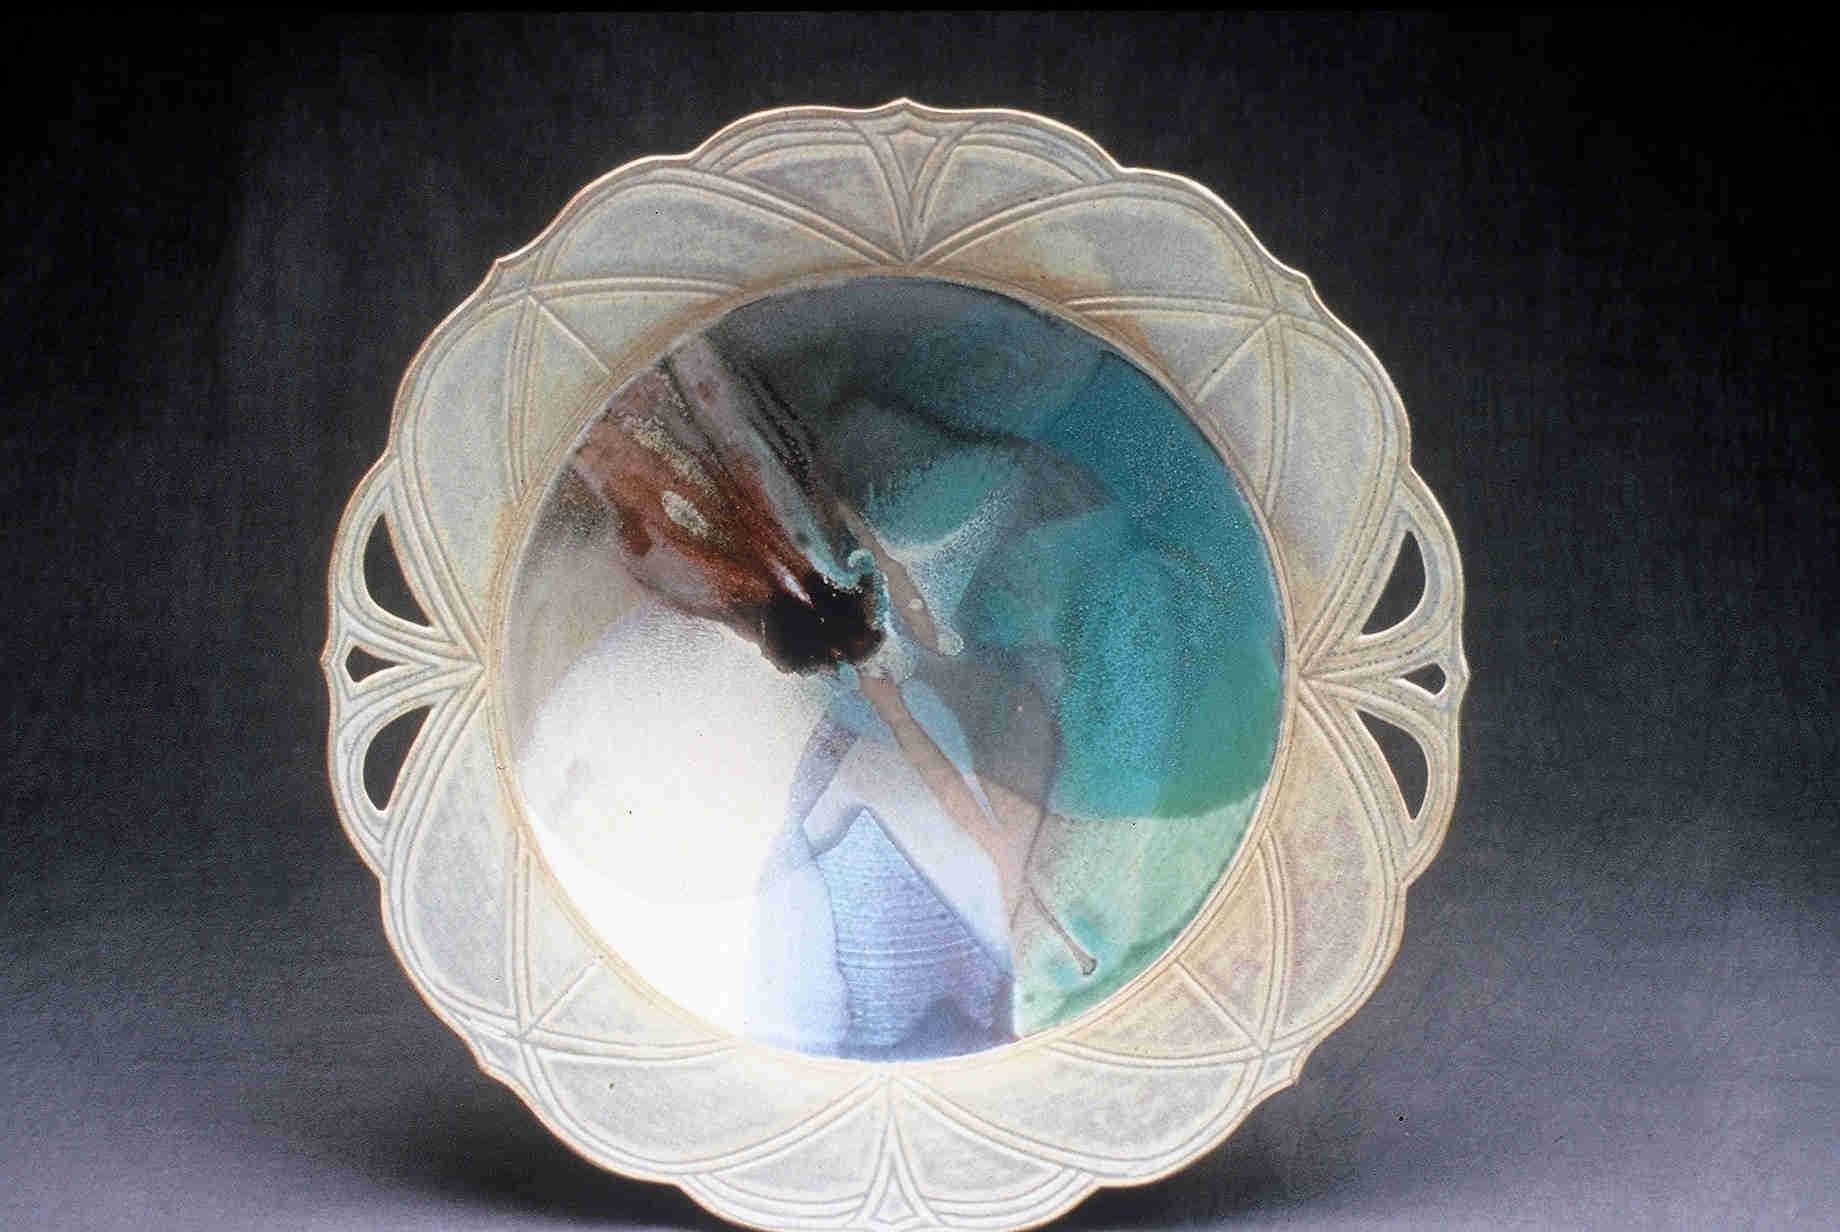 Valerie Metcalfe. 2000. Cathedral bowl. Porcelain, 45.7 cm w x 11.4 cm deep..